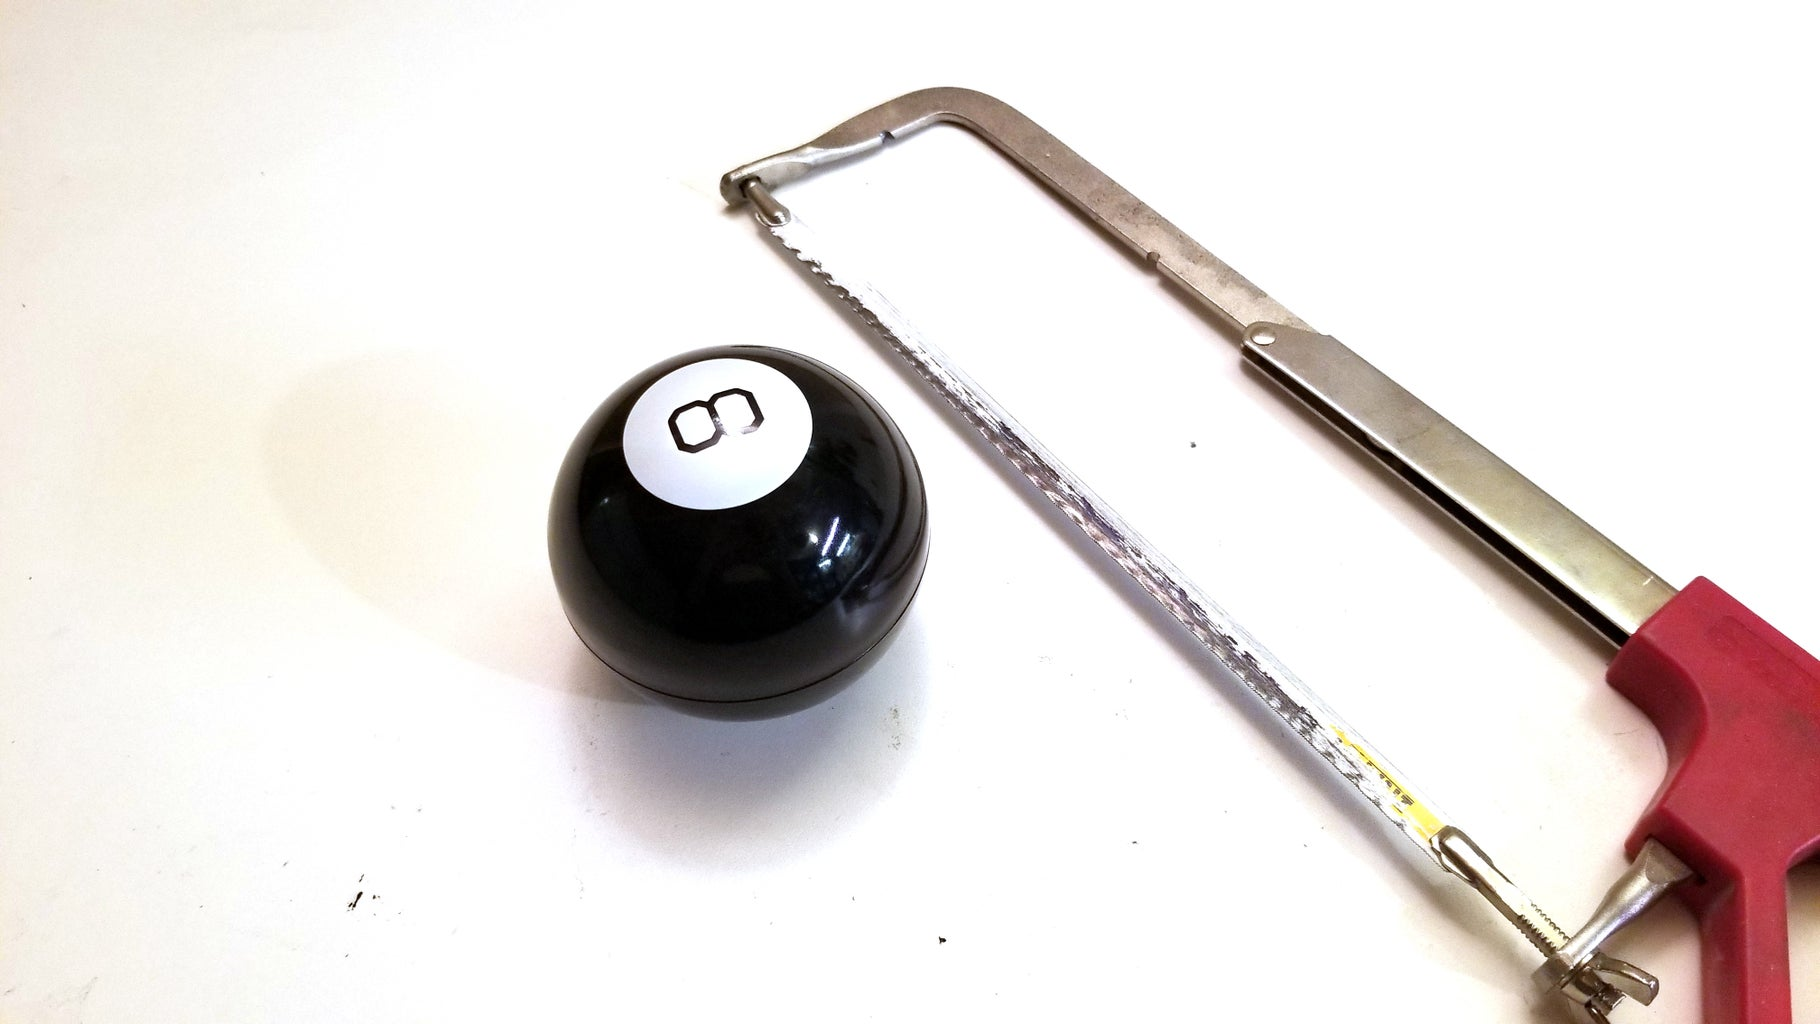 Cut Magic 8-Ball in Half